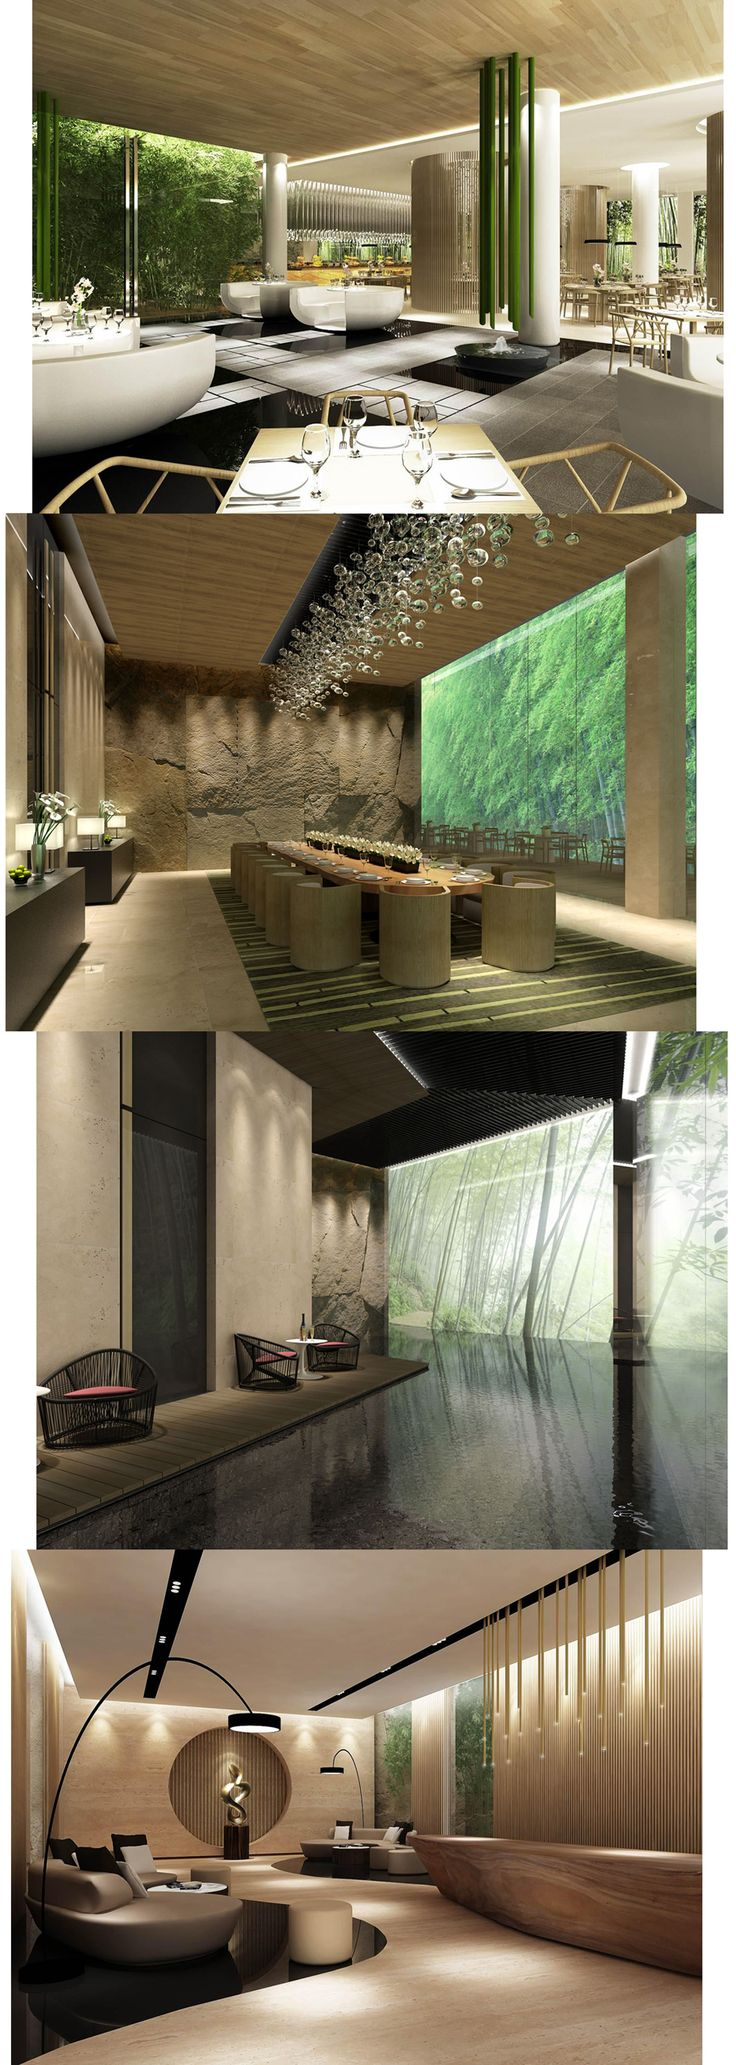 Amazing_3d_Visualization_Architecture_Bamboo Resort Hotel